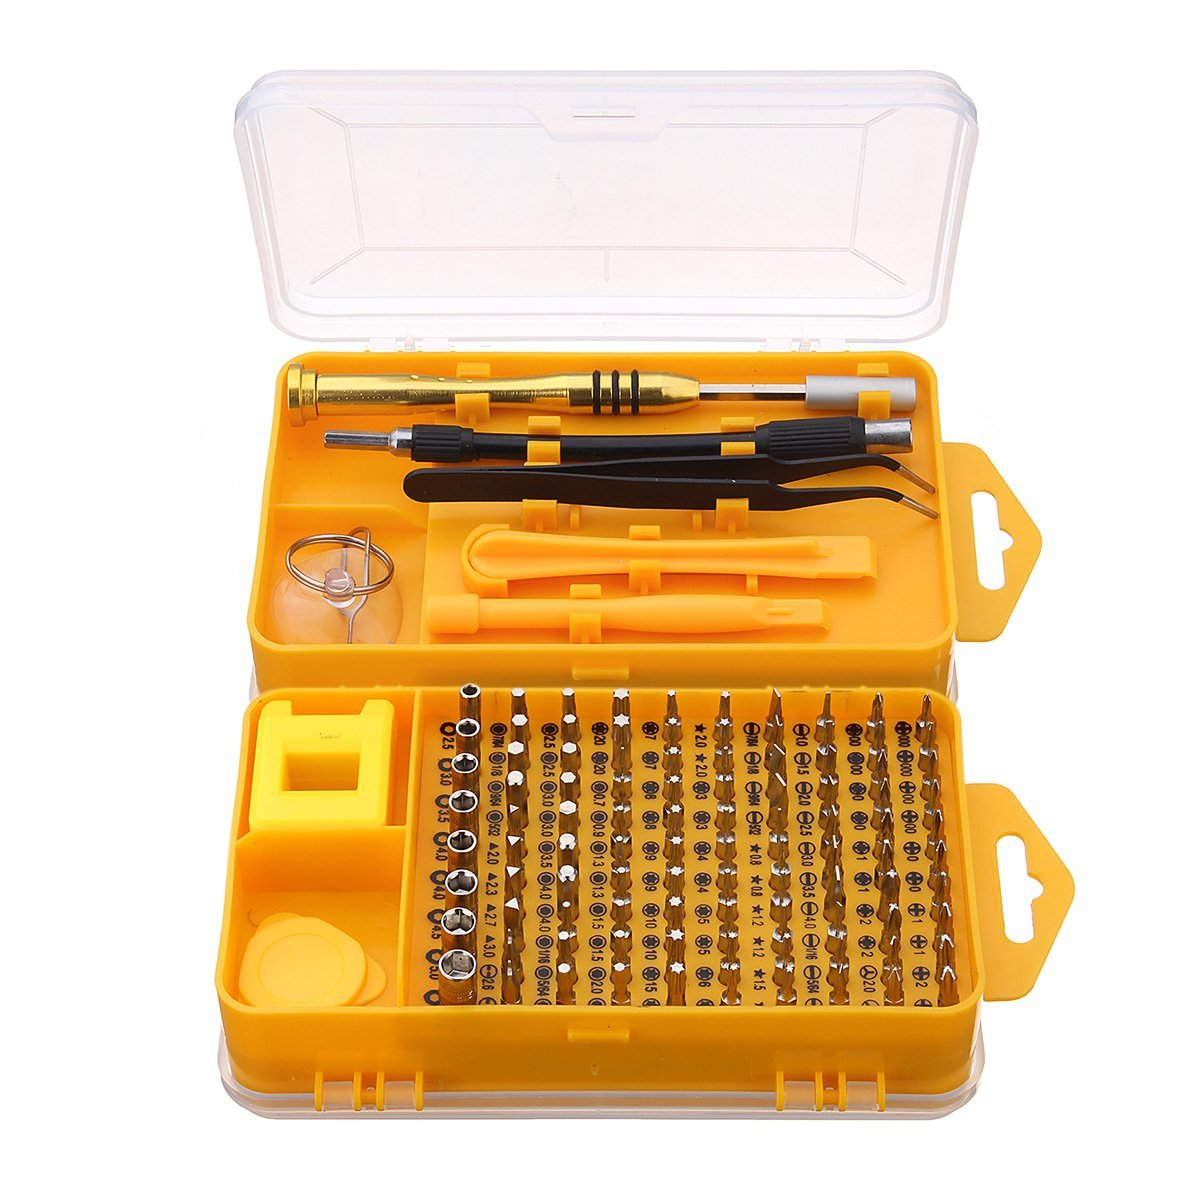 108 in 1 Schraubendreher Sätze computer reparatur werkzeuge Ätherisches tools Digitalen handy reparatur P20